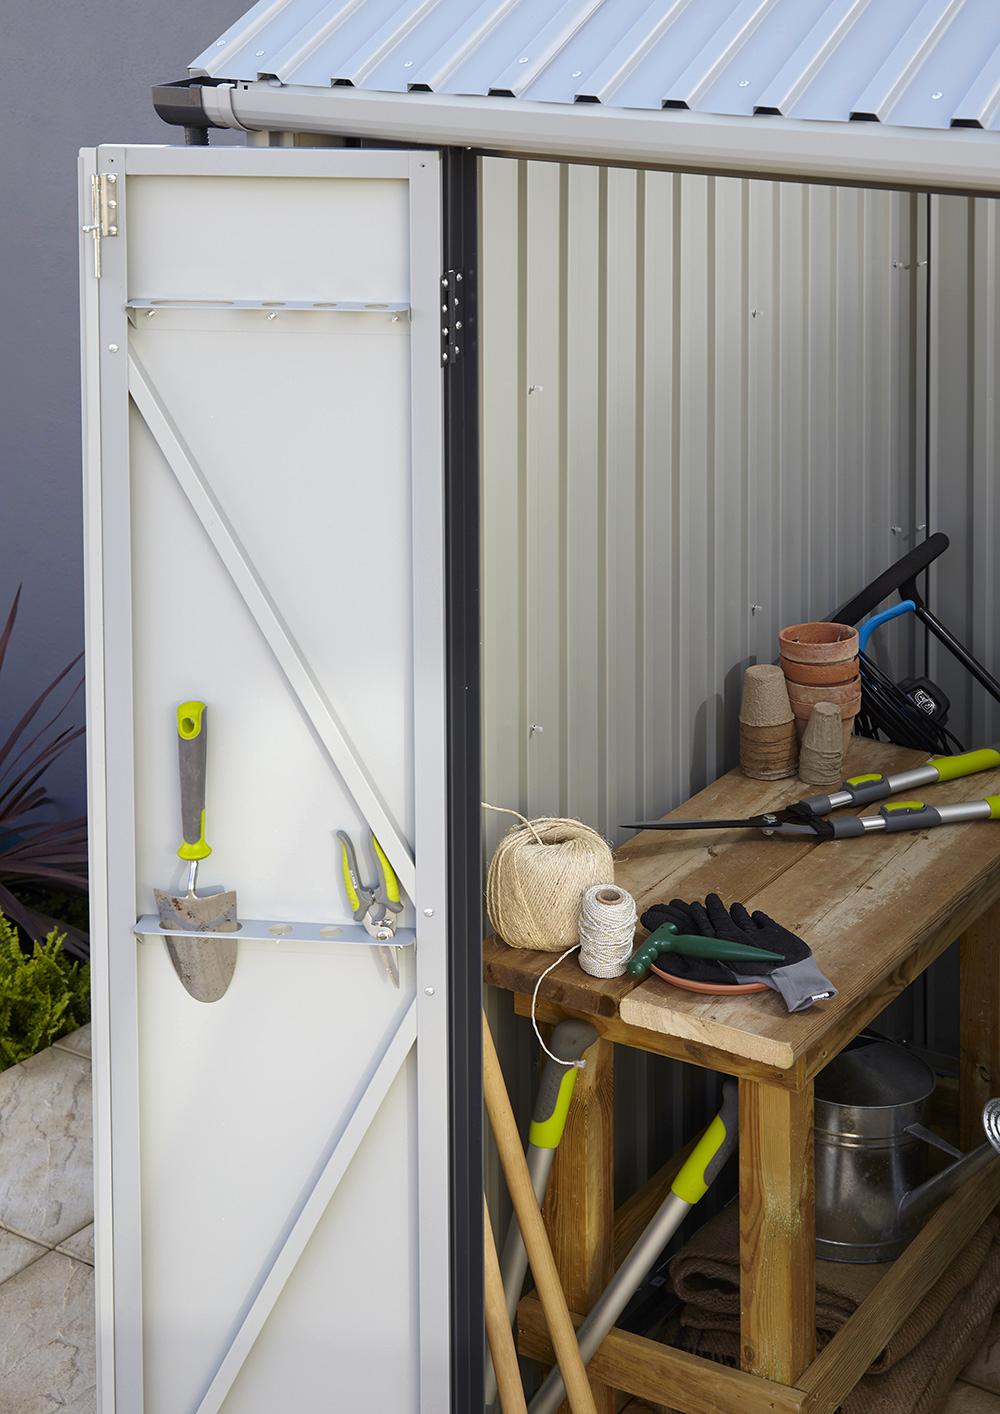 abri de jardin boite a outils nouveau abris castorama dossier de presse jardin 2017 des abri de jardin boite a outils